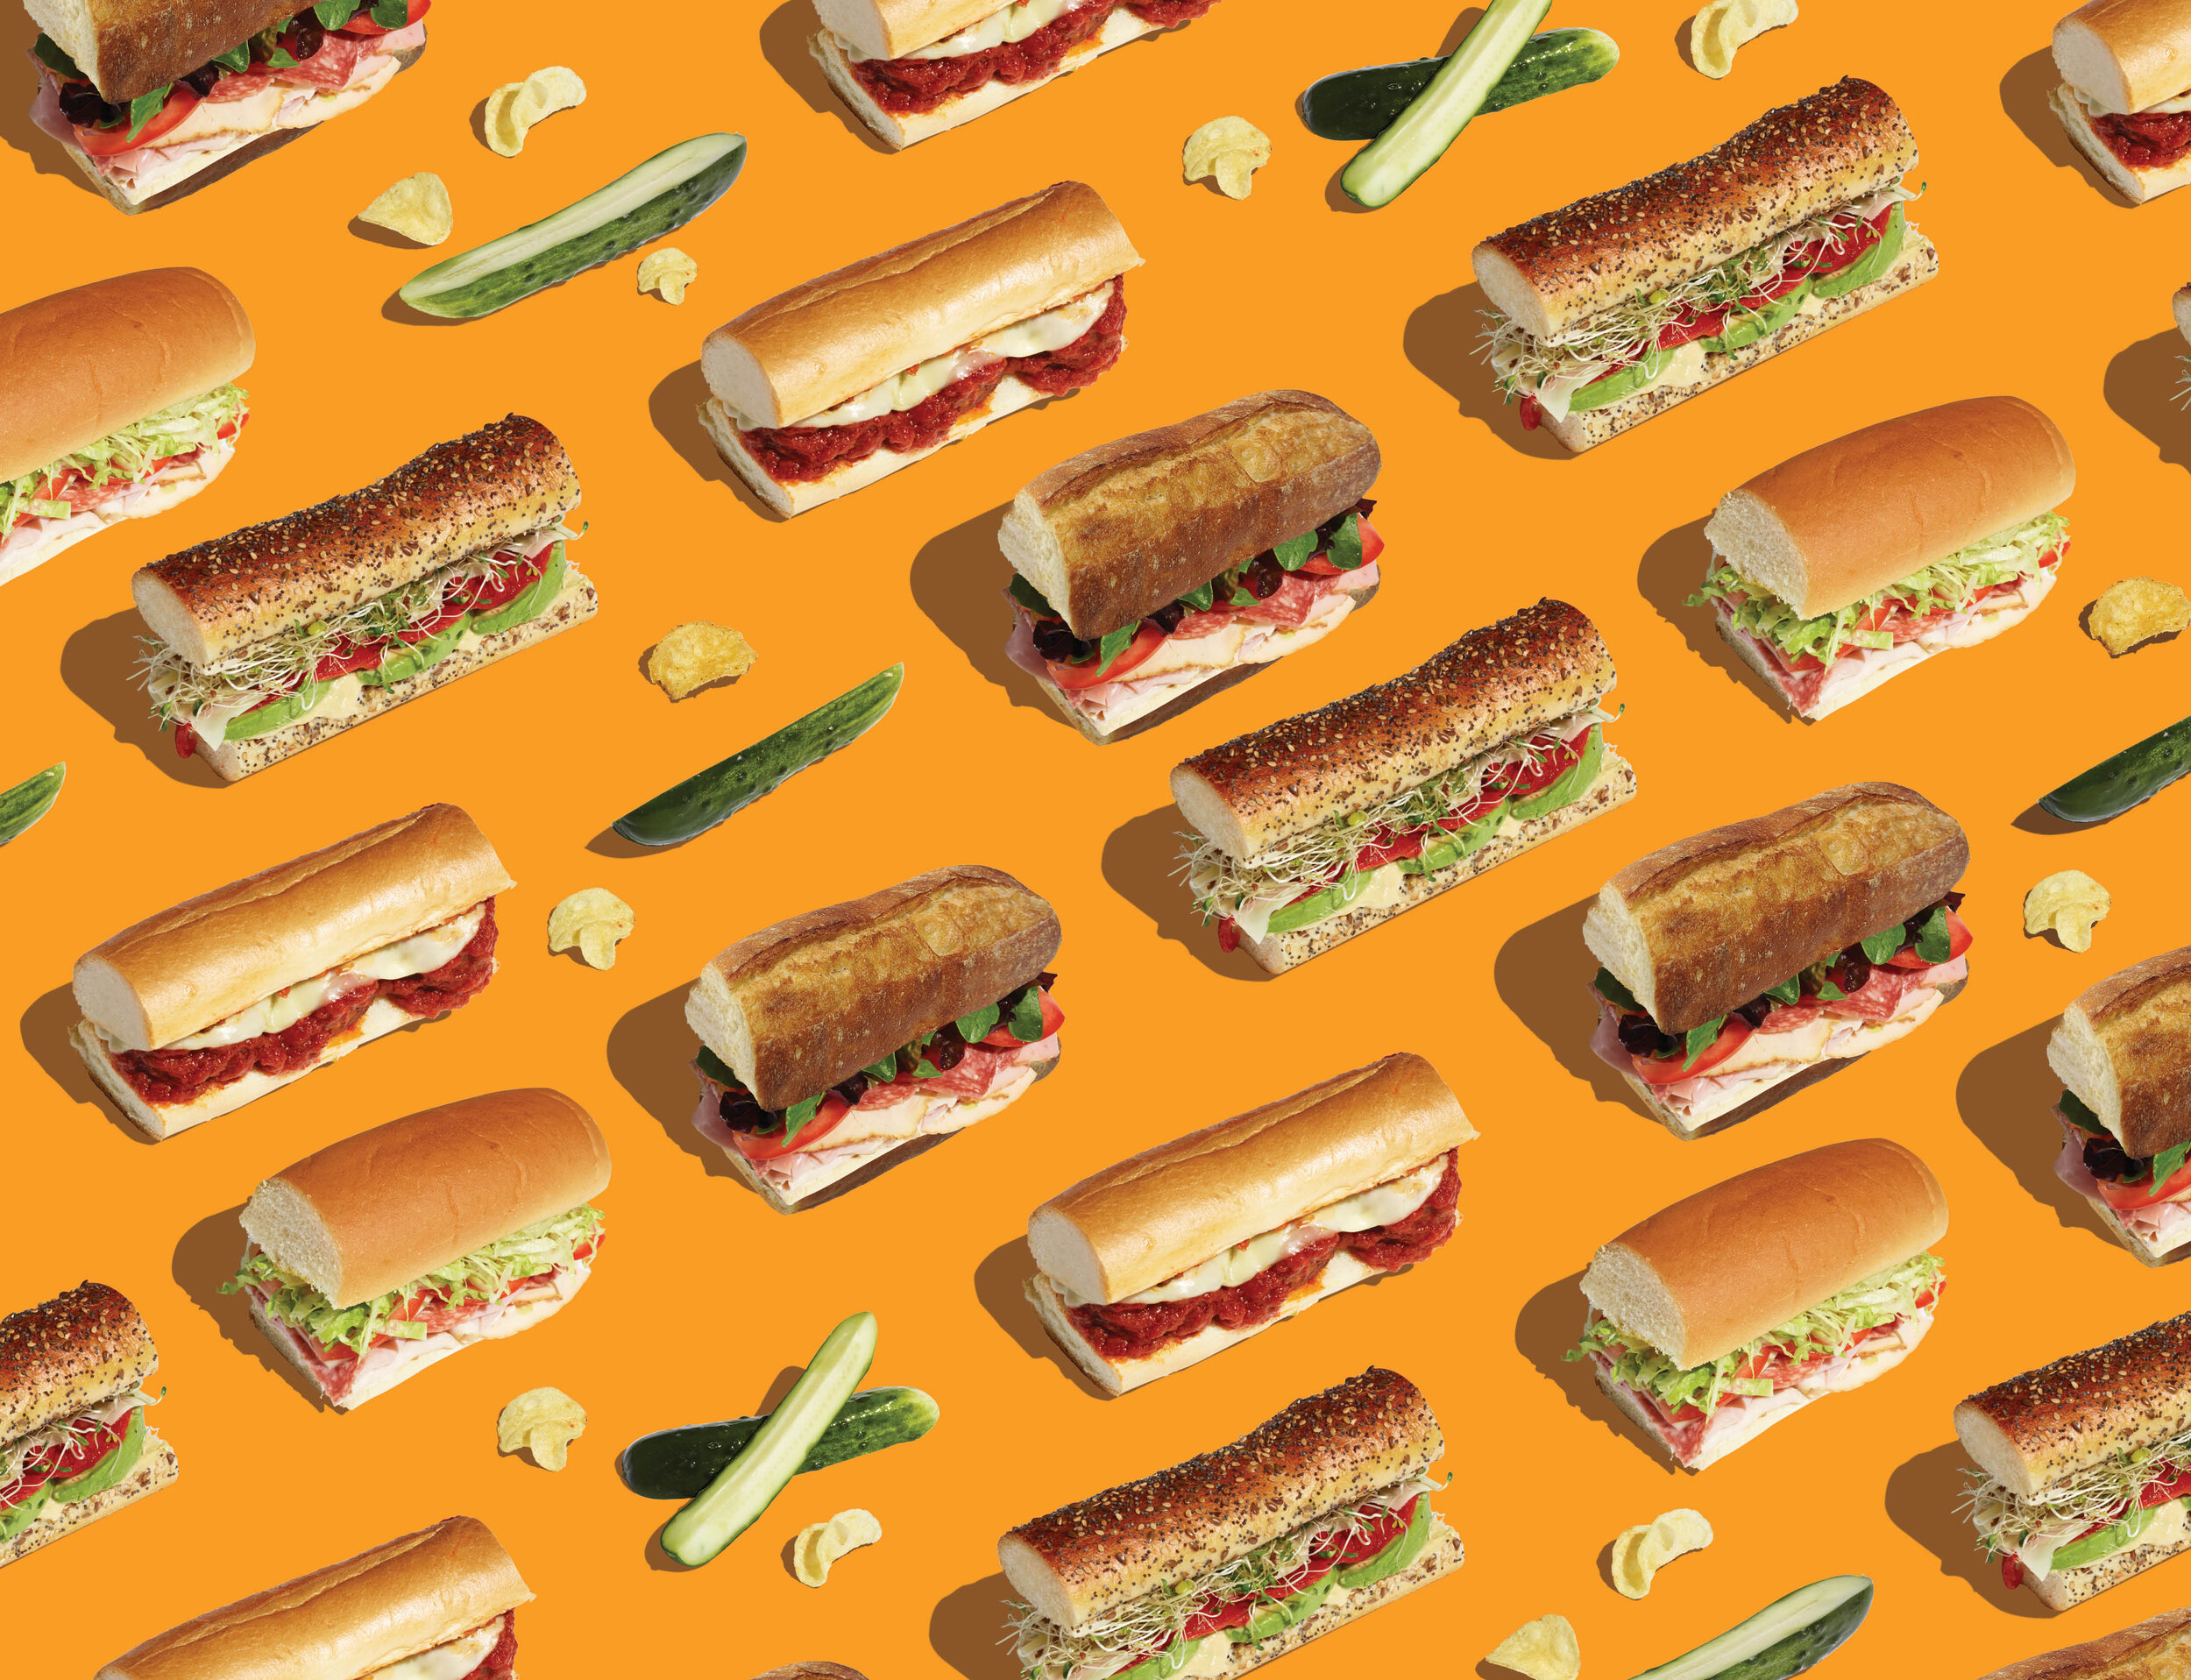 Sandwich_Grubhub_BG.jpg